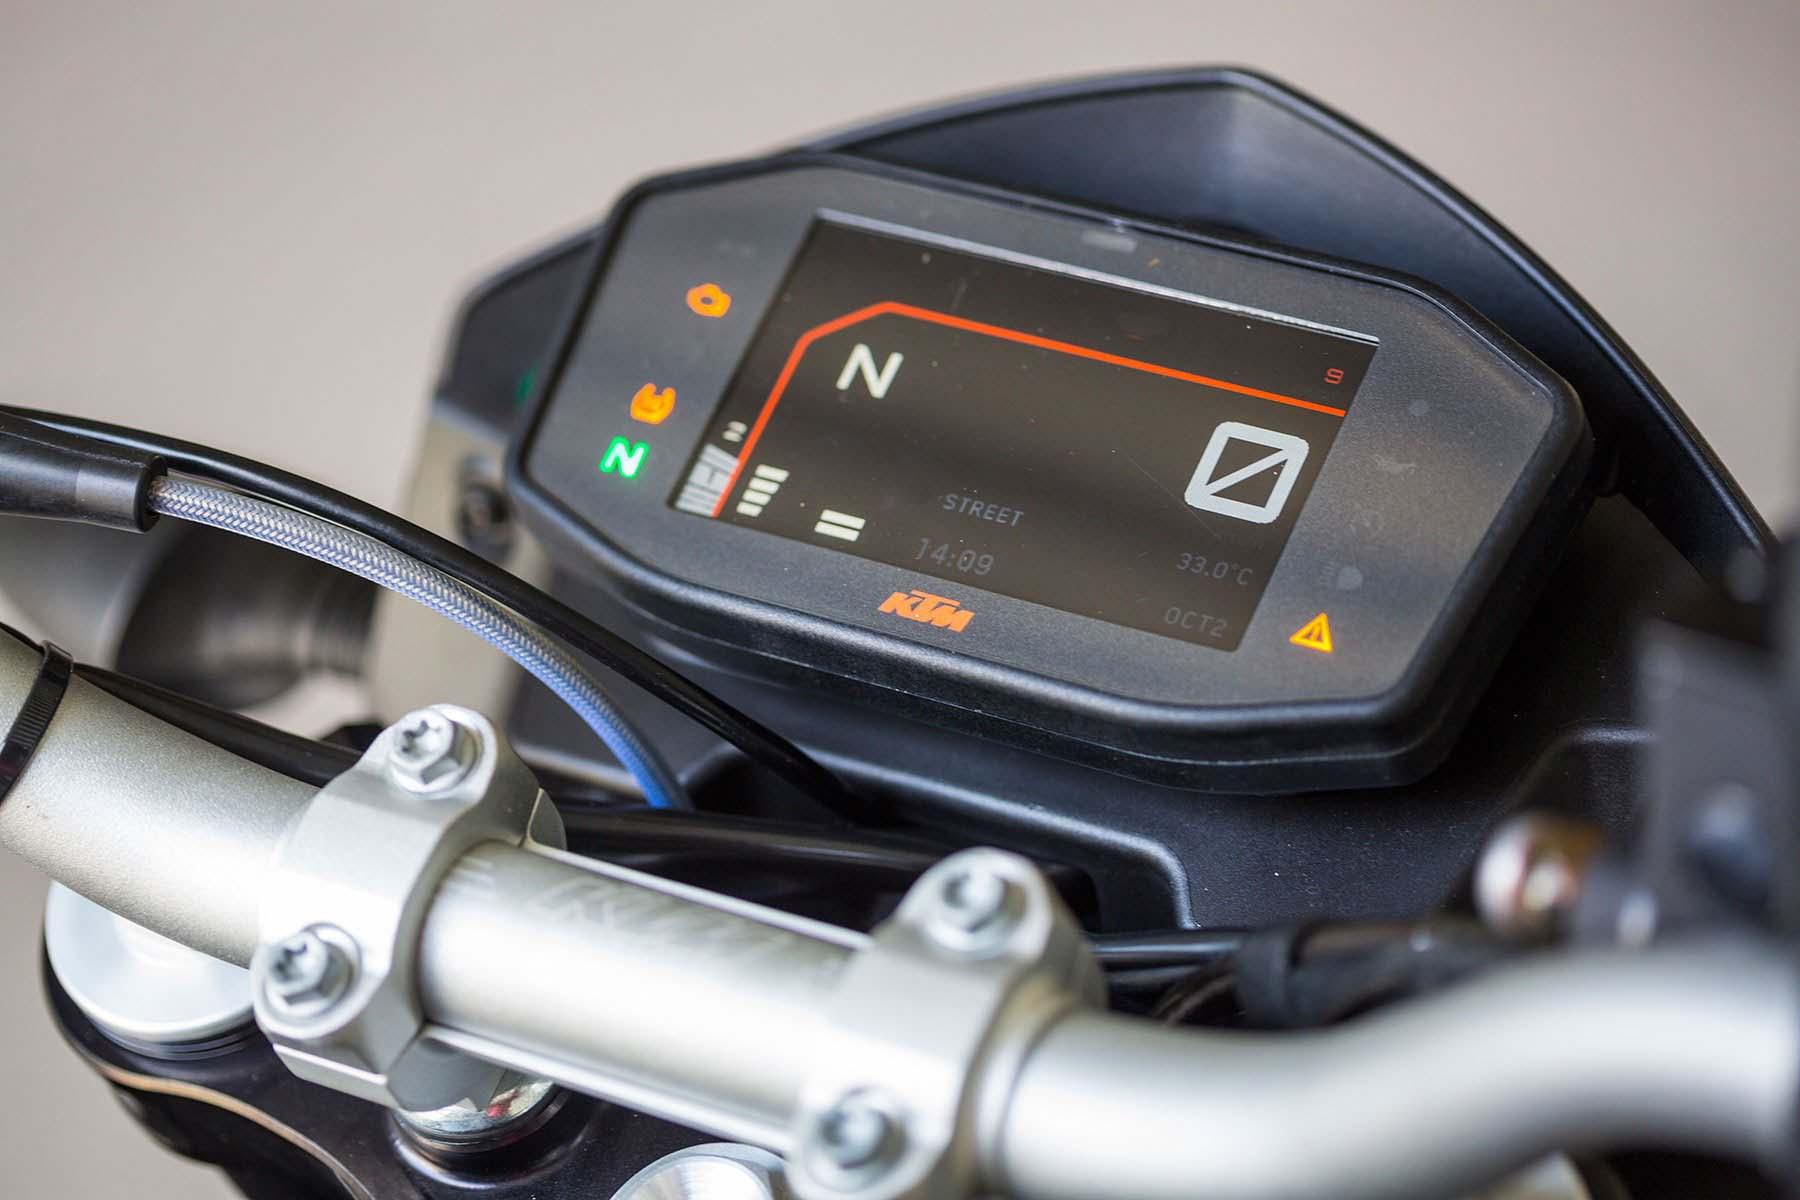 World\'s most powerful Single improves itself: 2016 KTM Duke 690 ...